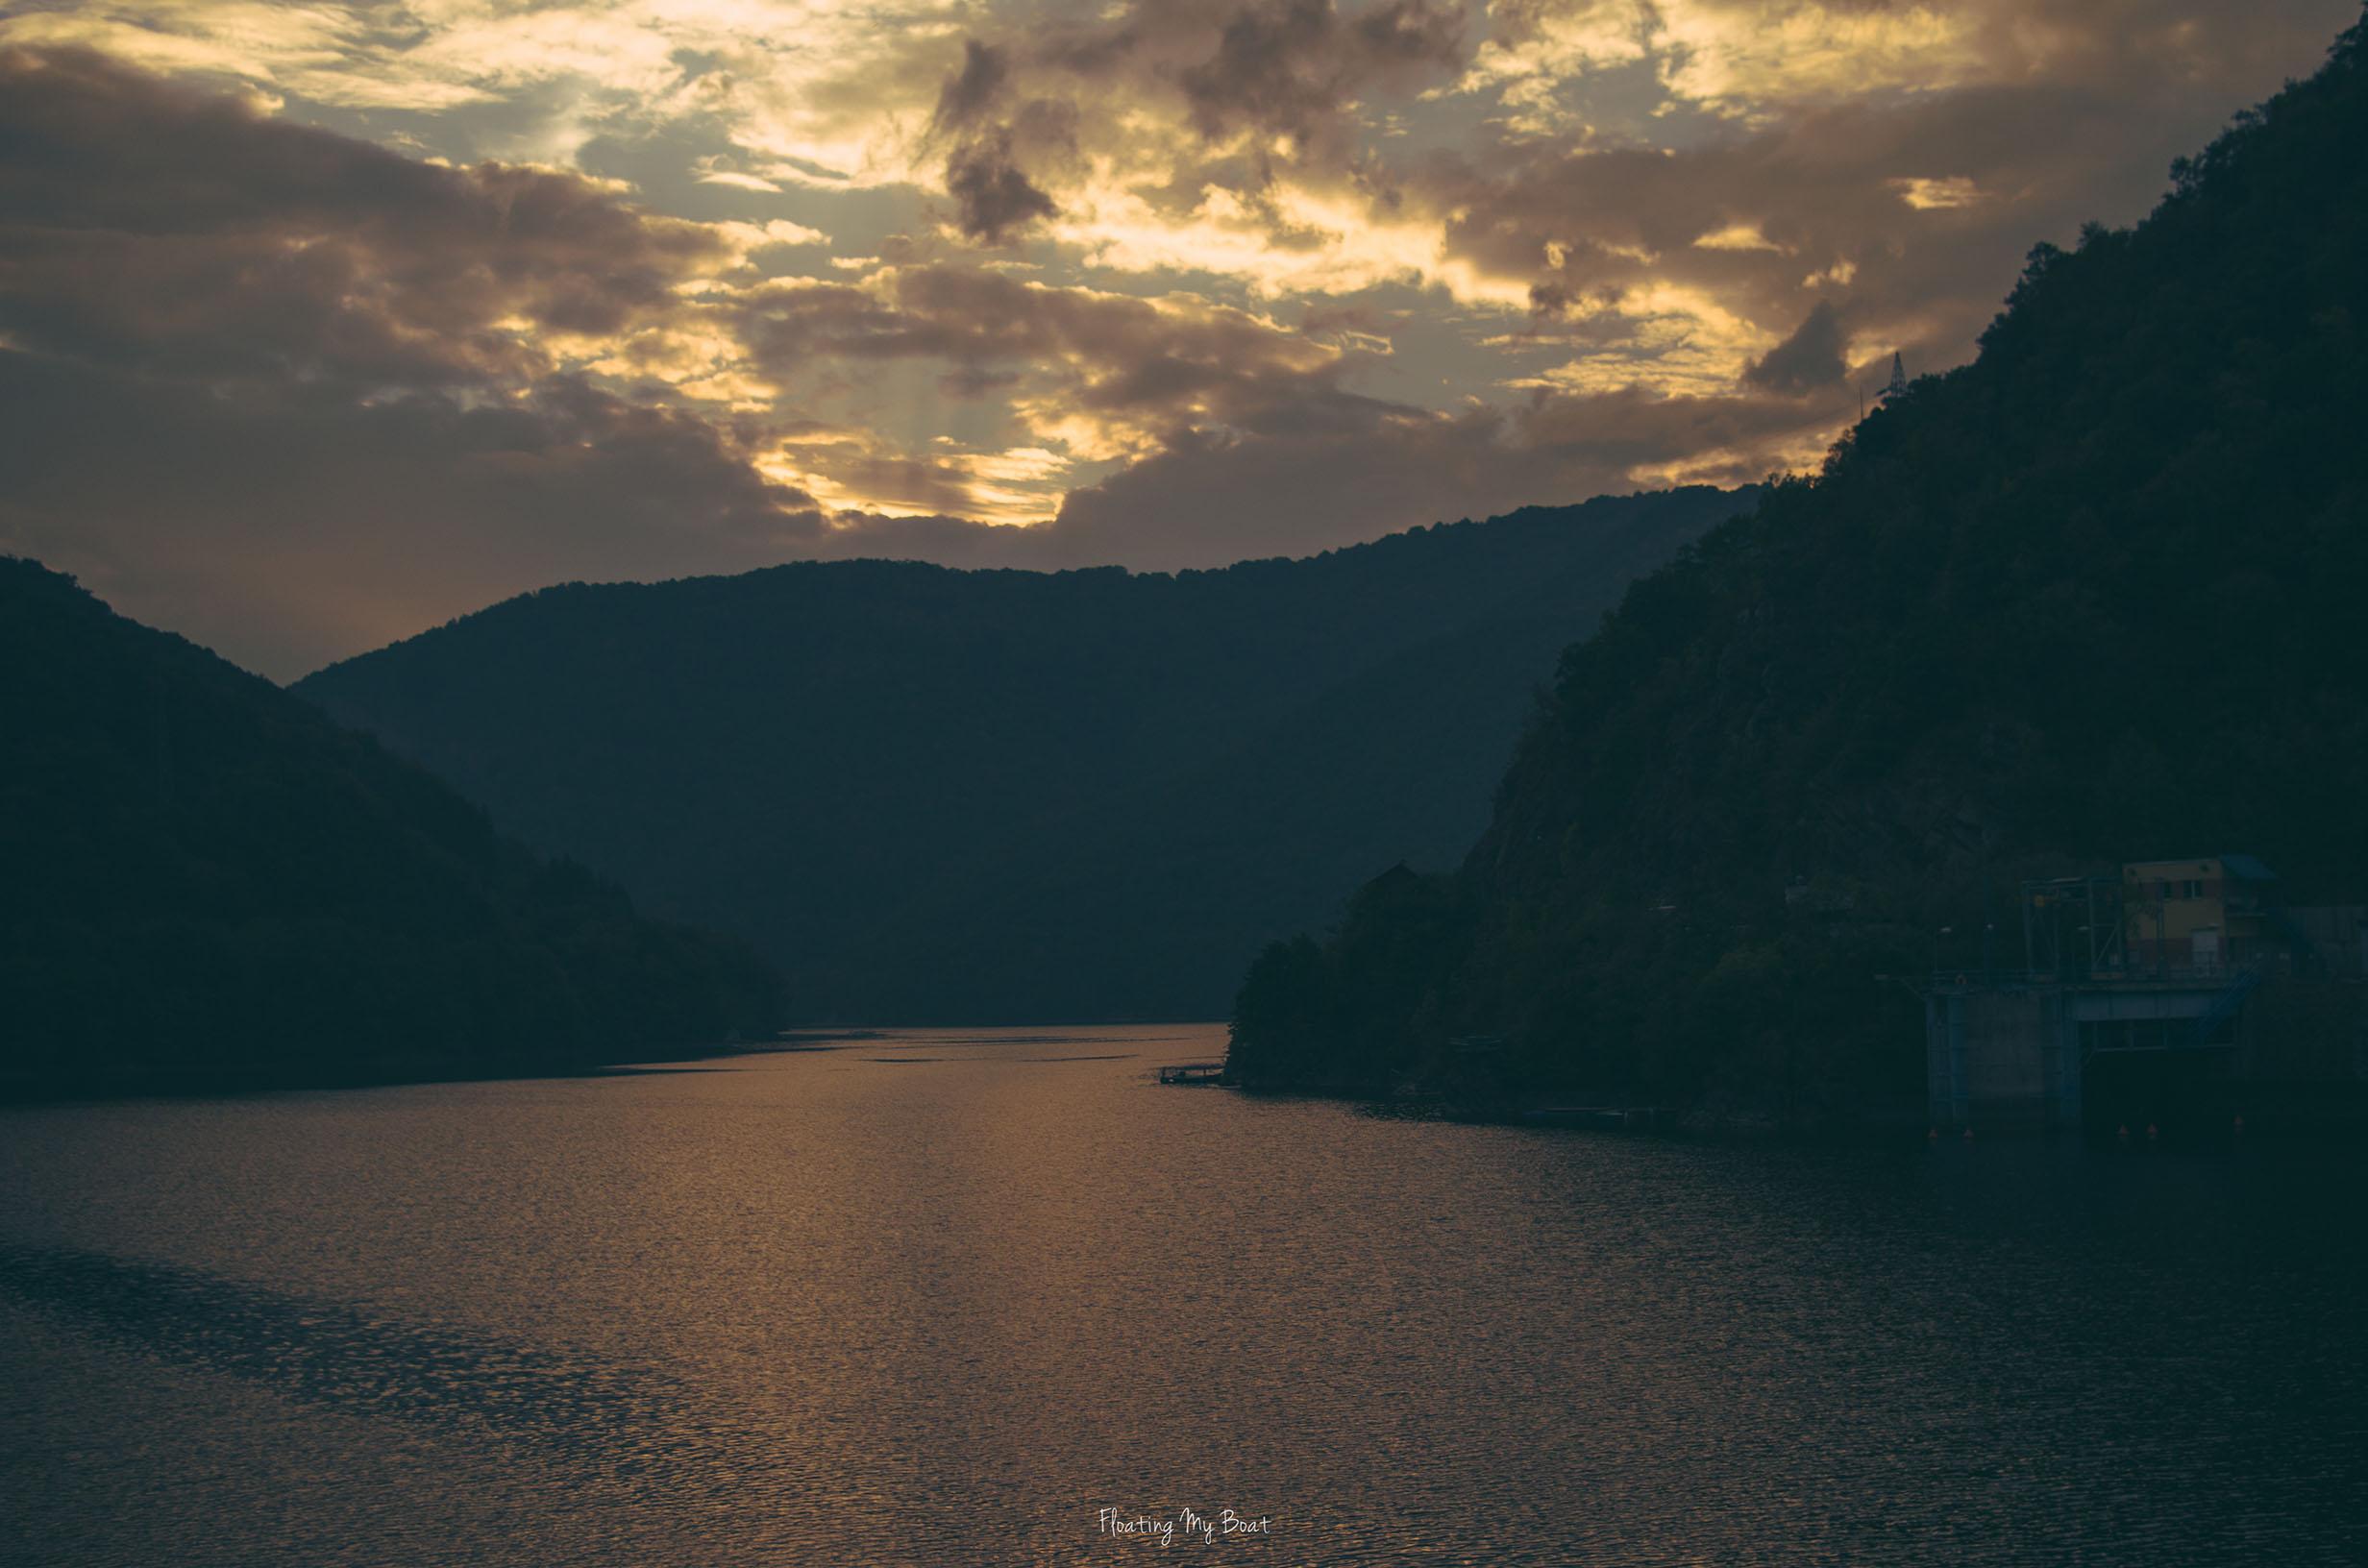 tarnita-lake-cluj-napoka-romania-sunset